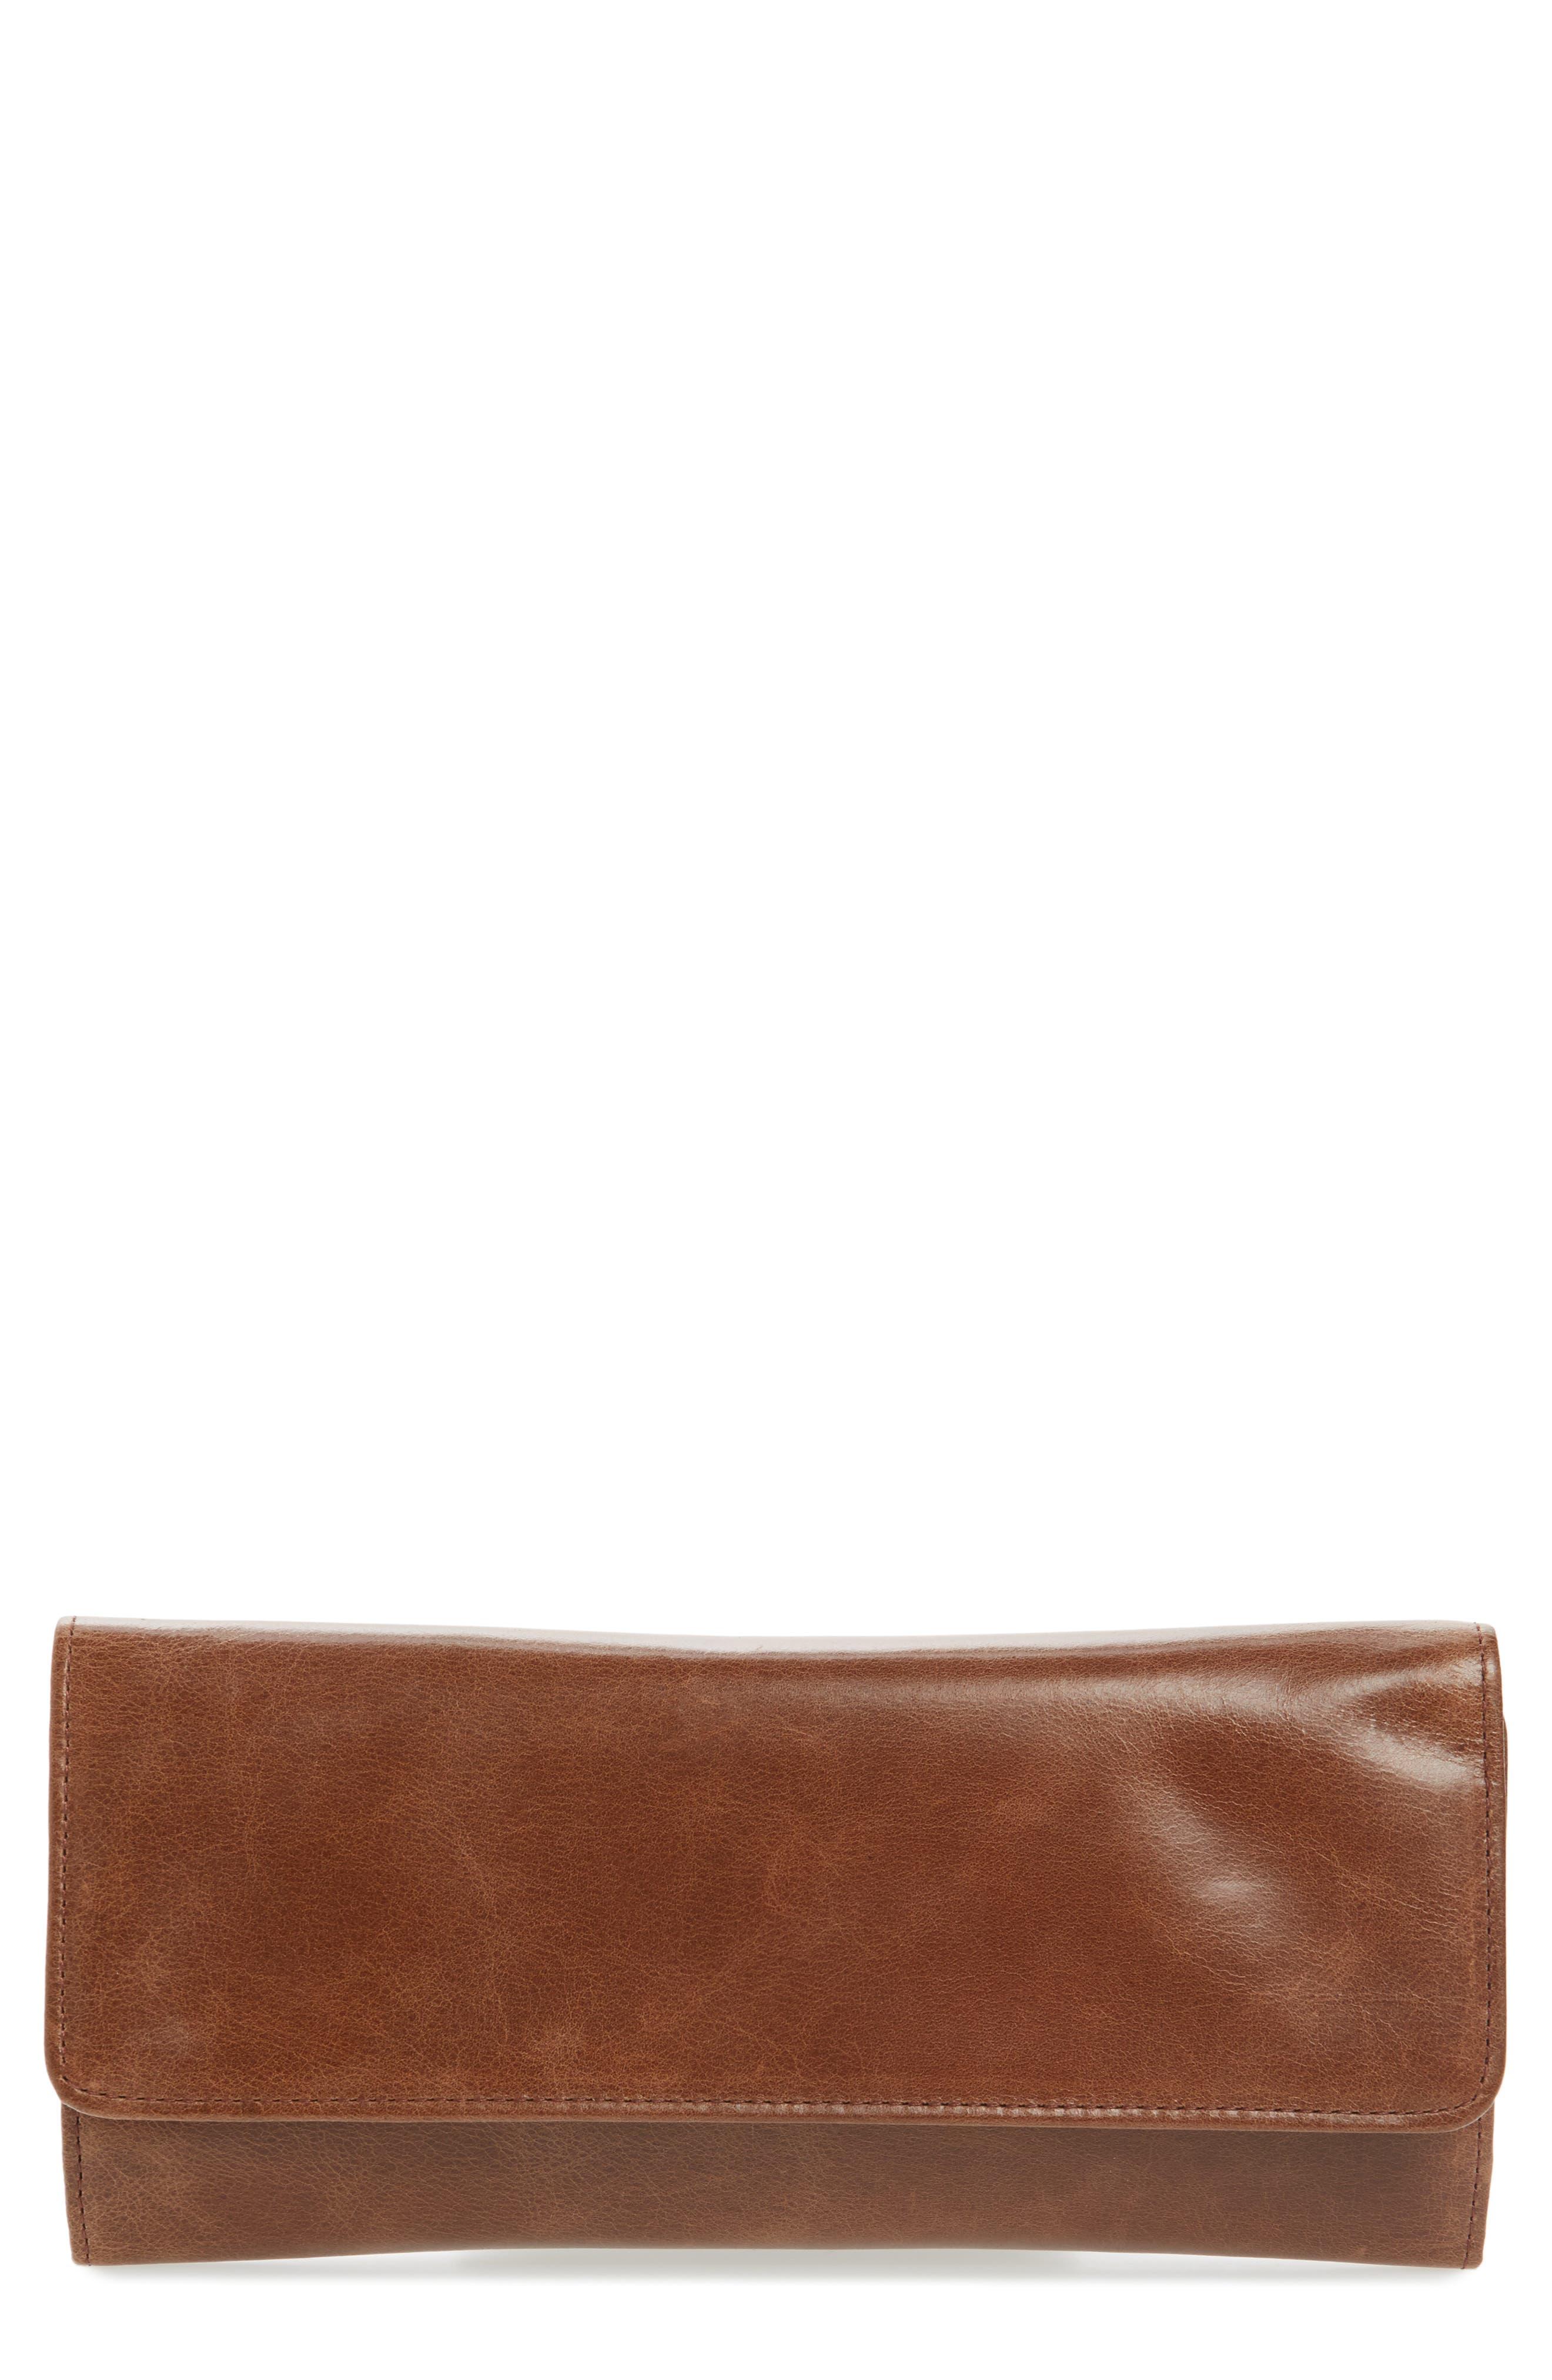 Main Image - Hobo 'Sadie' Leather Wallet